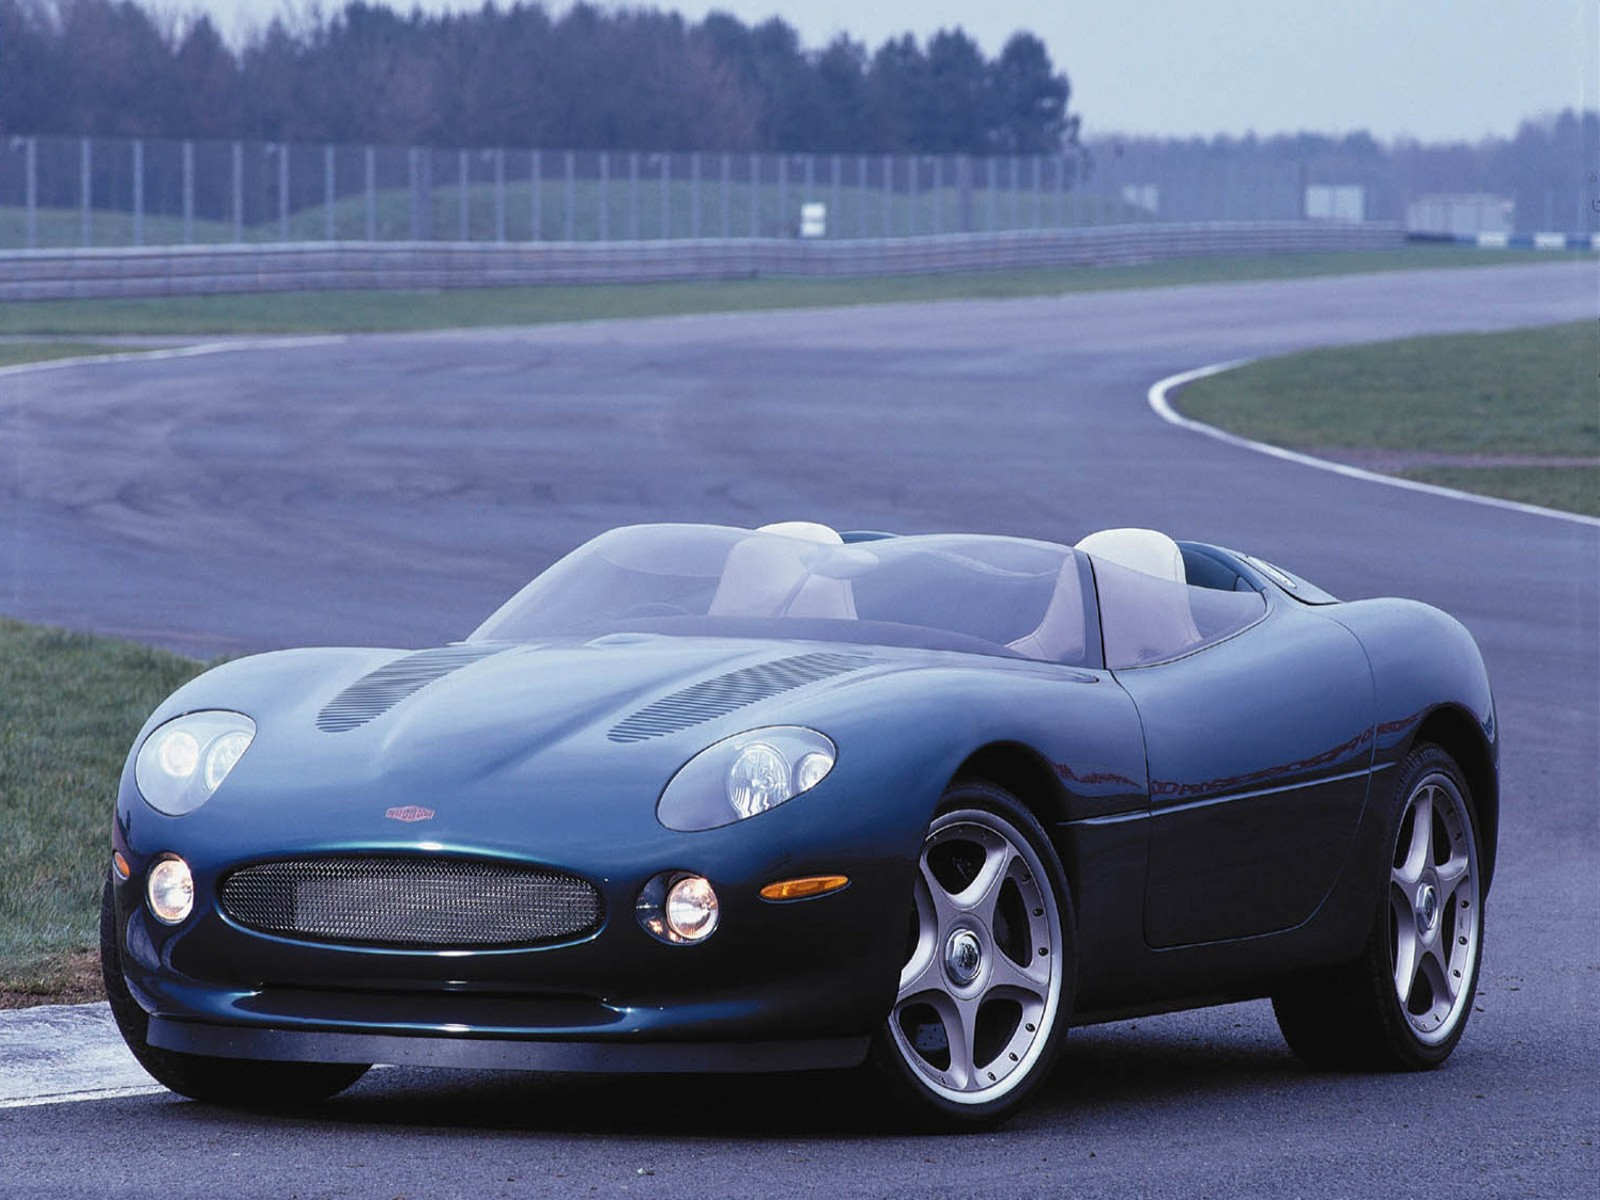 1998 Jaguar XK180 Concept High Resolution Wallpaper Free